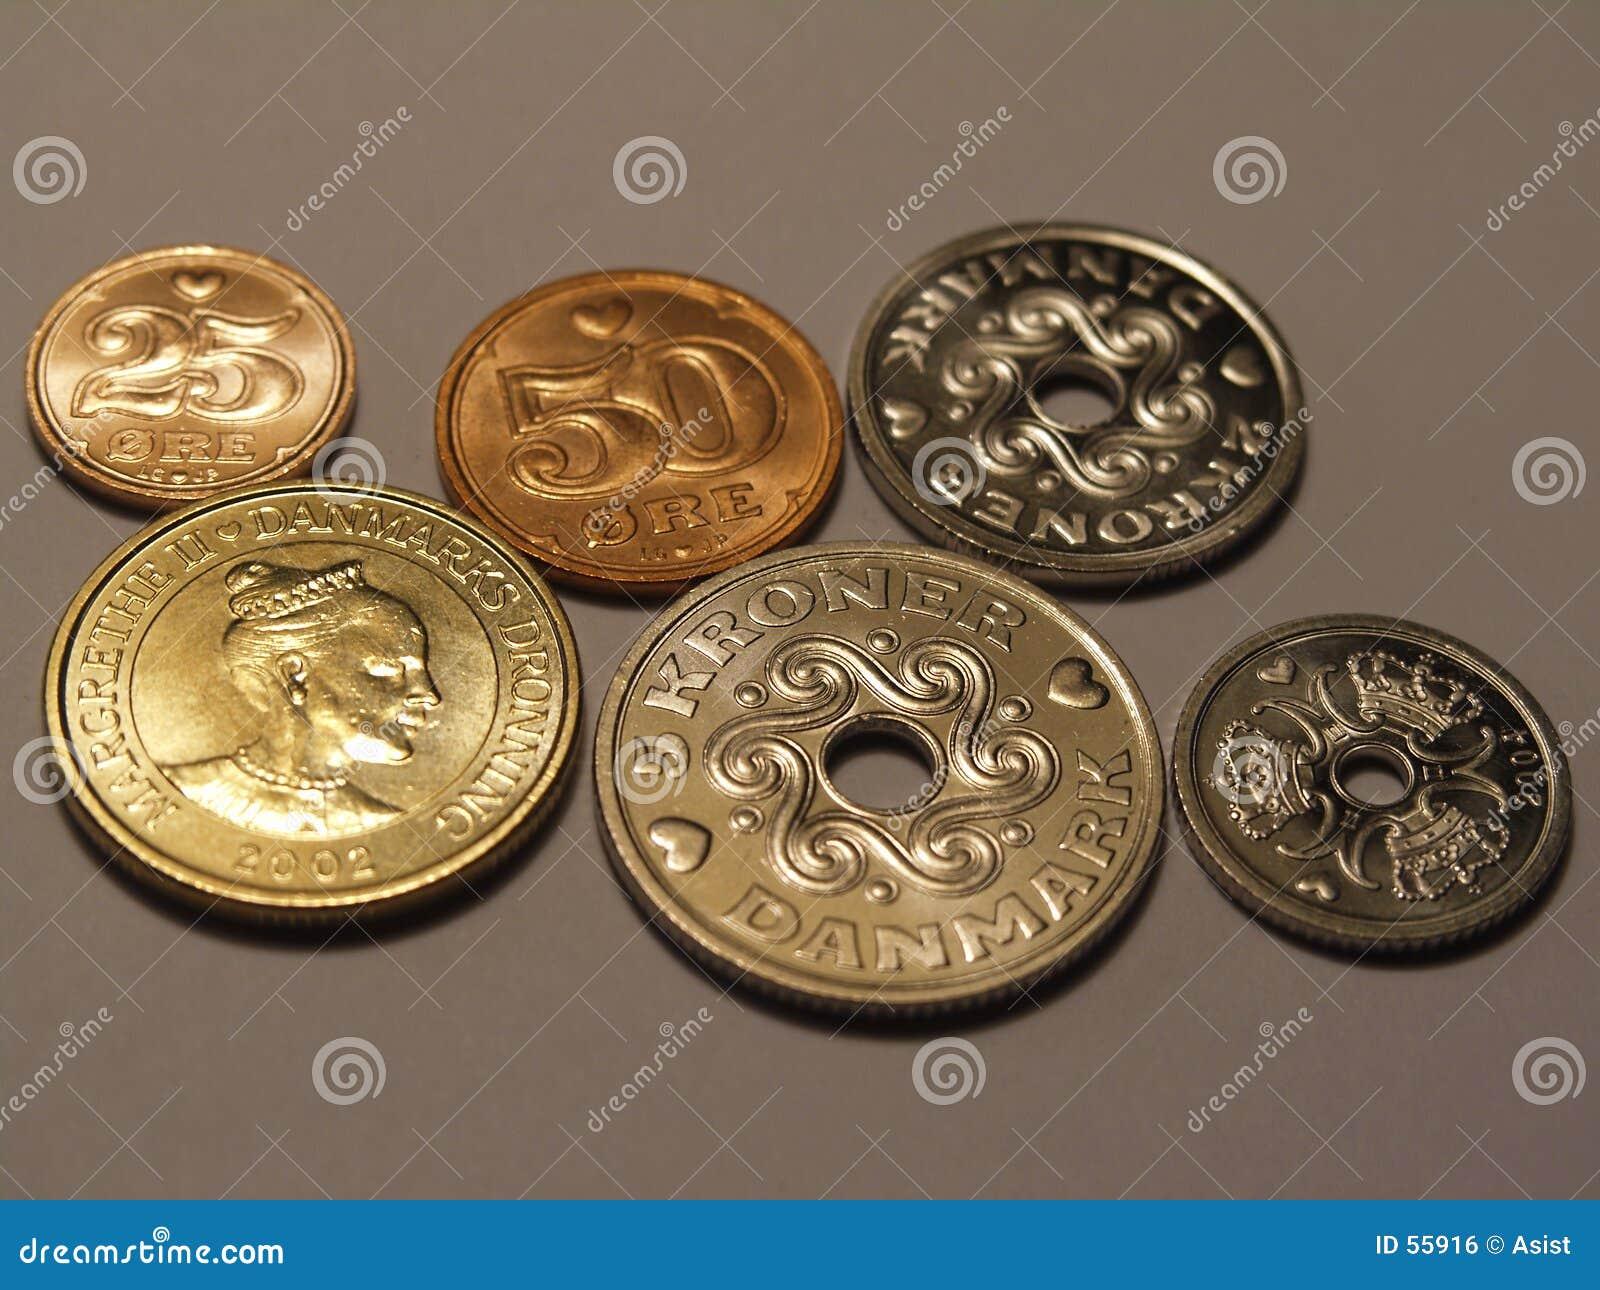 Coins danish